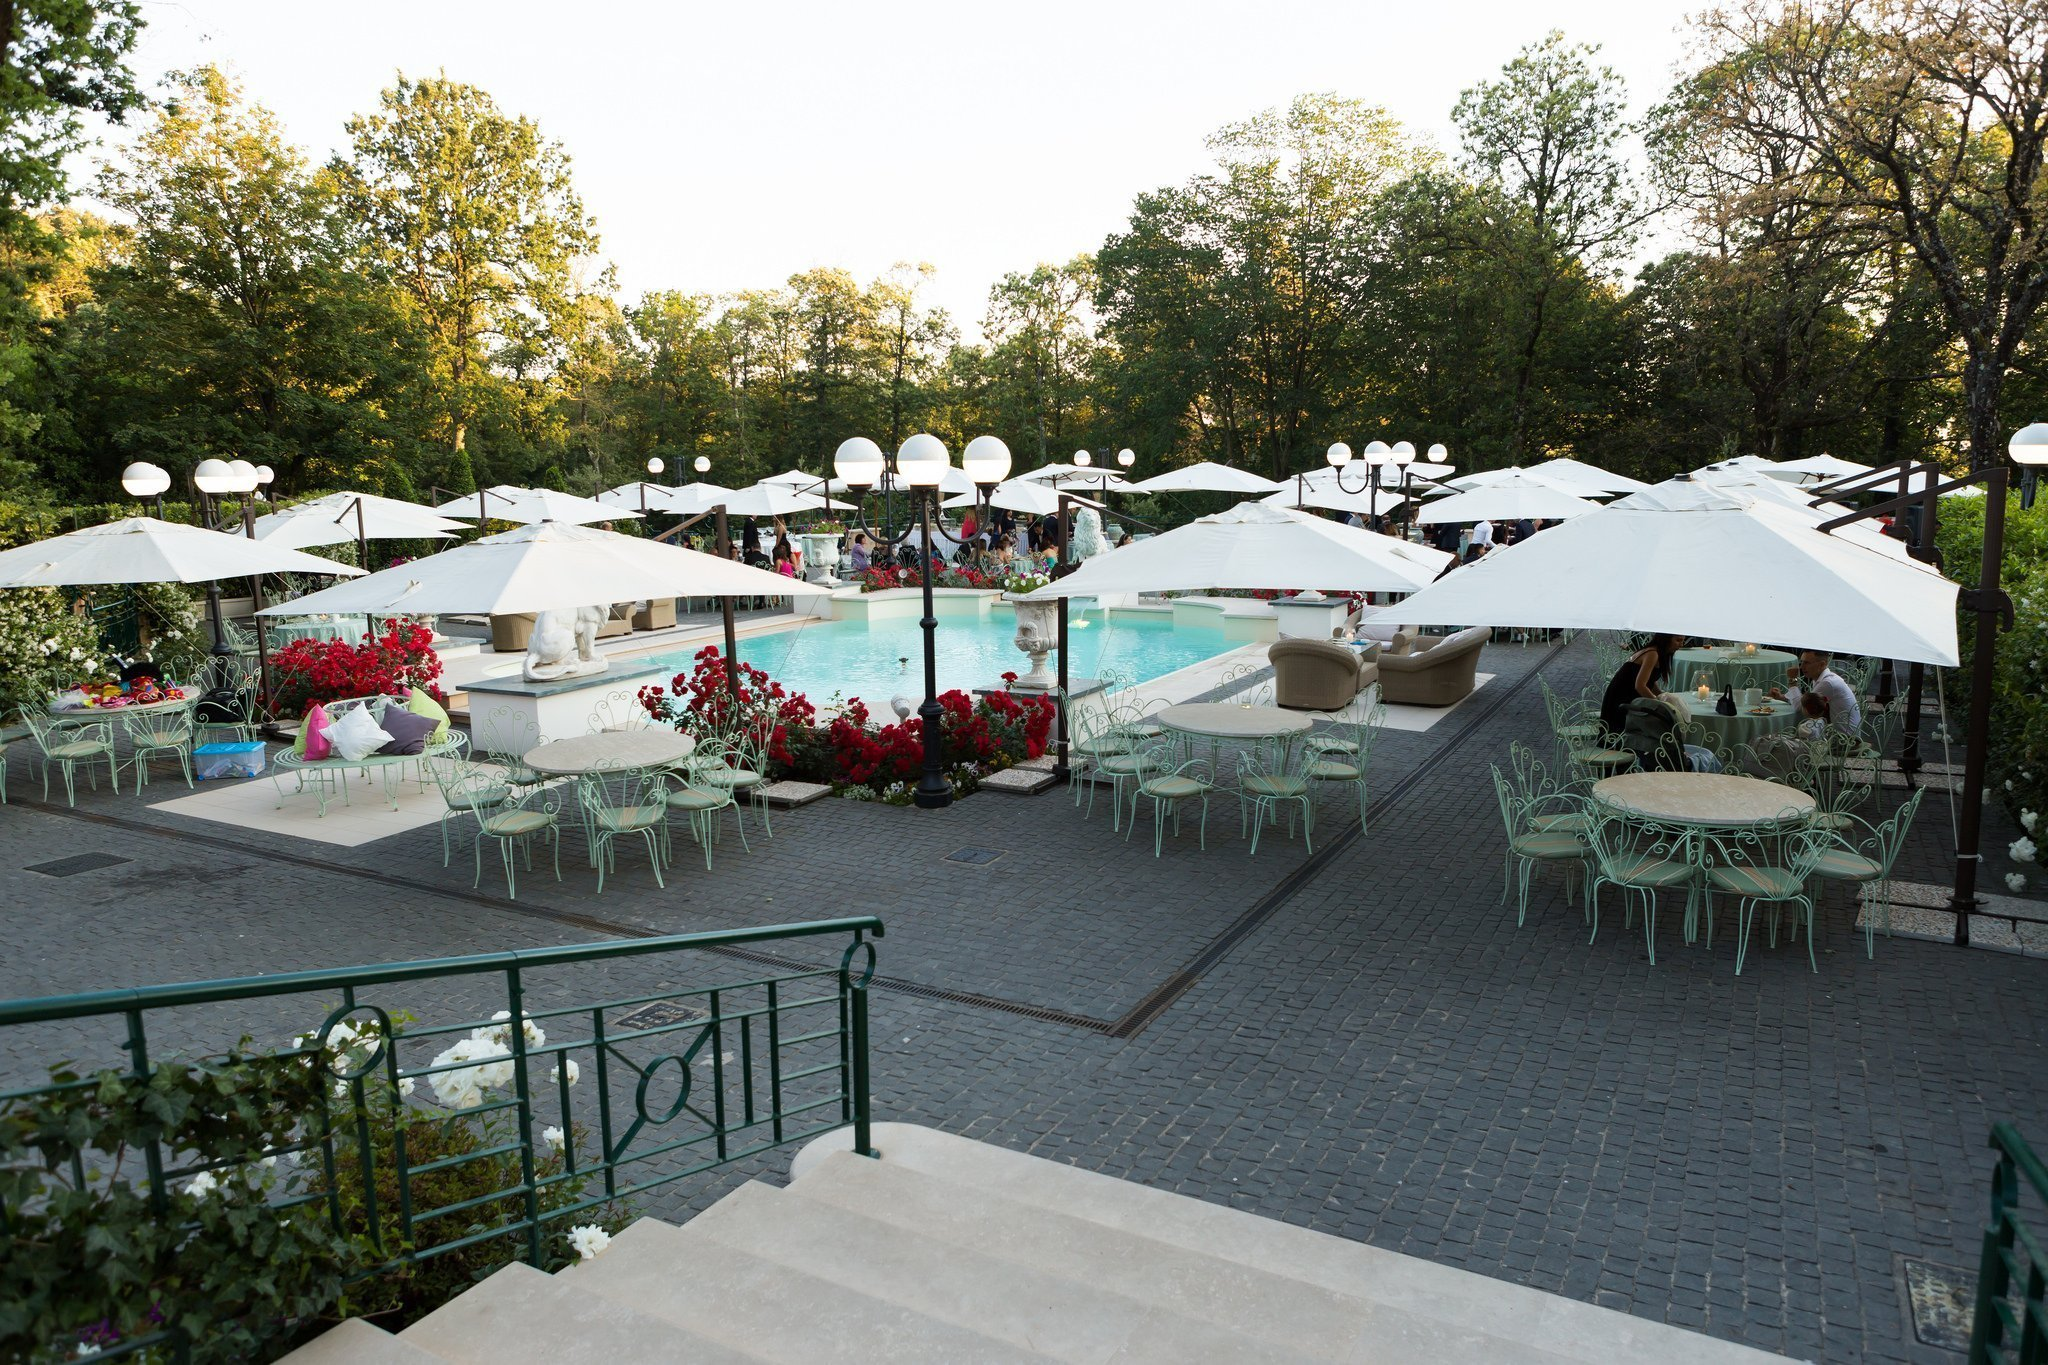 Matrimonio al ristorante la Foresta: Ricevimento esterno